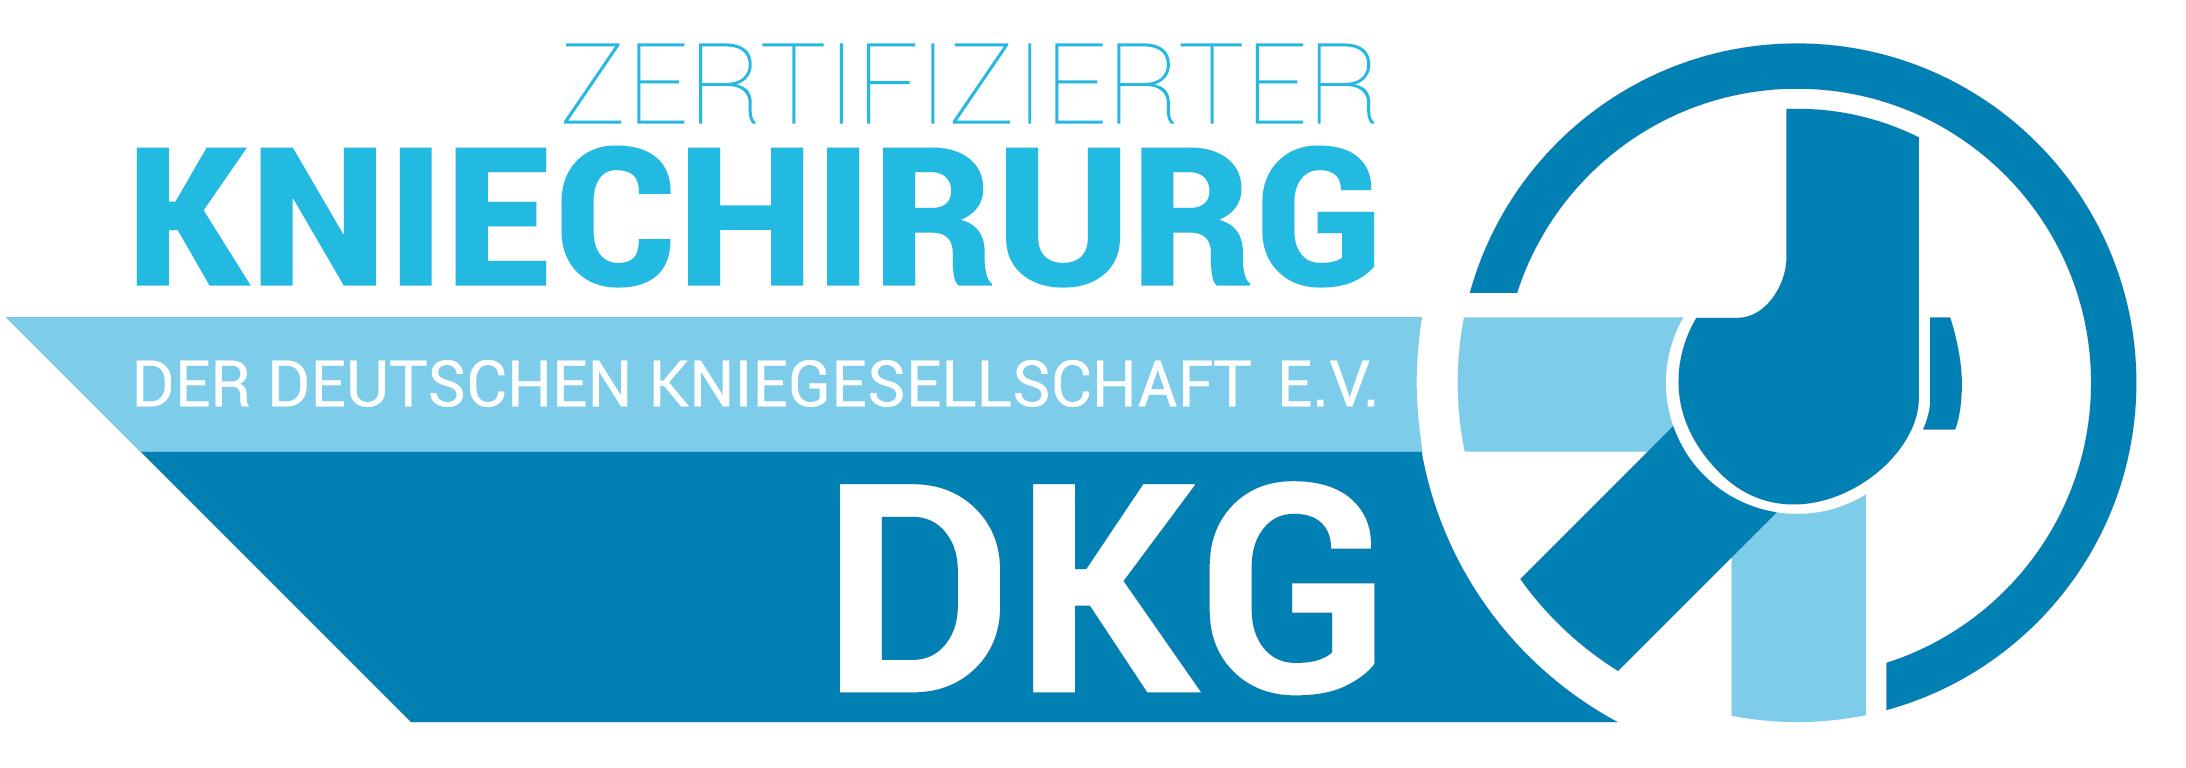 Zertifizierte Kniechirurgie im Alb-Donau Klinikum Ehingen